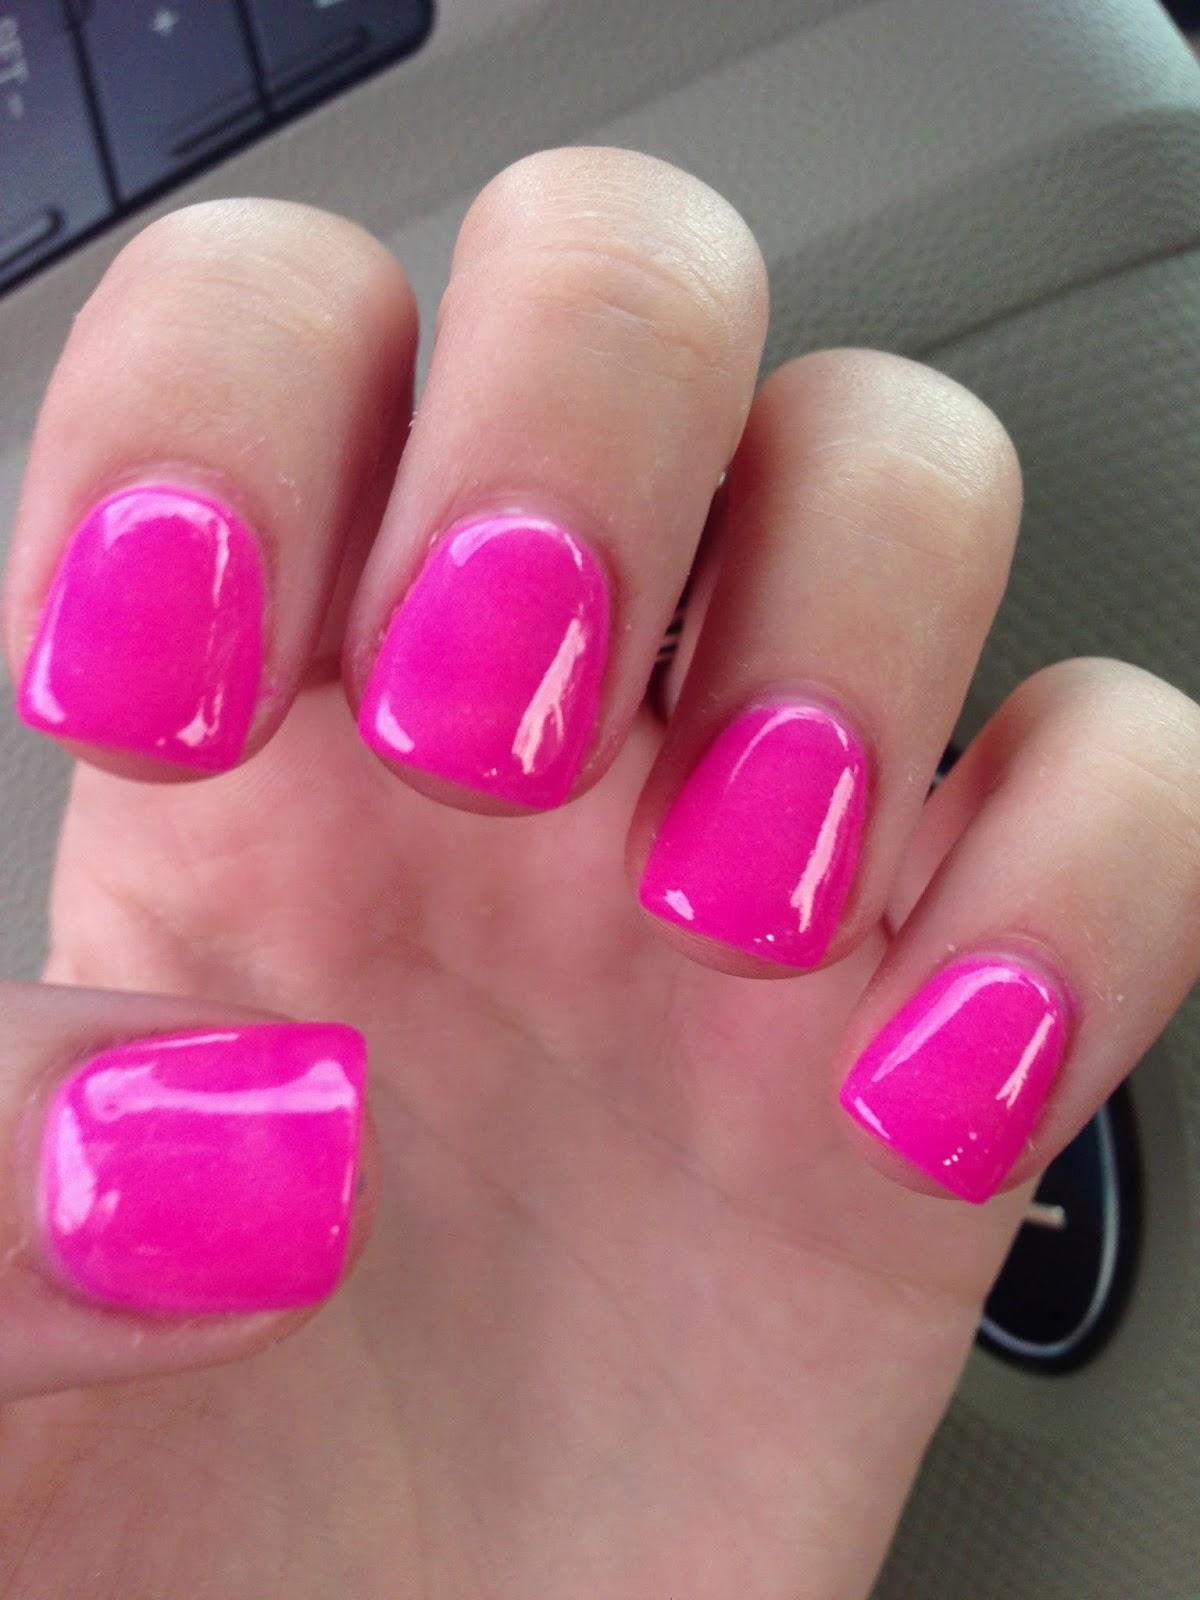 dipped nails versus gel nails photo - 2